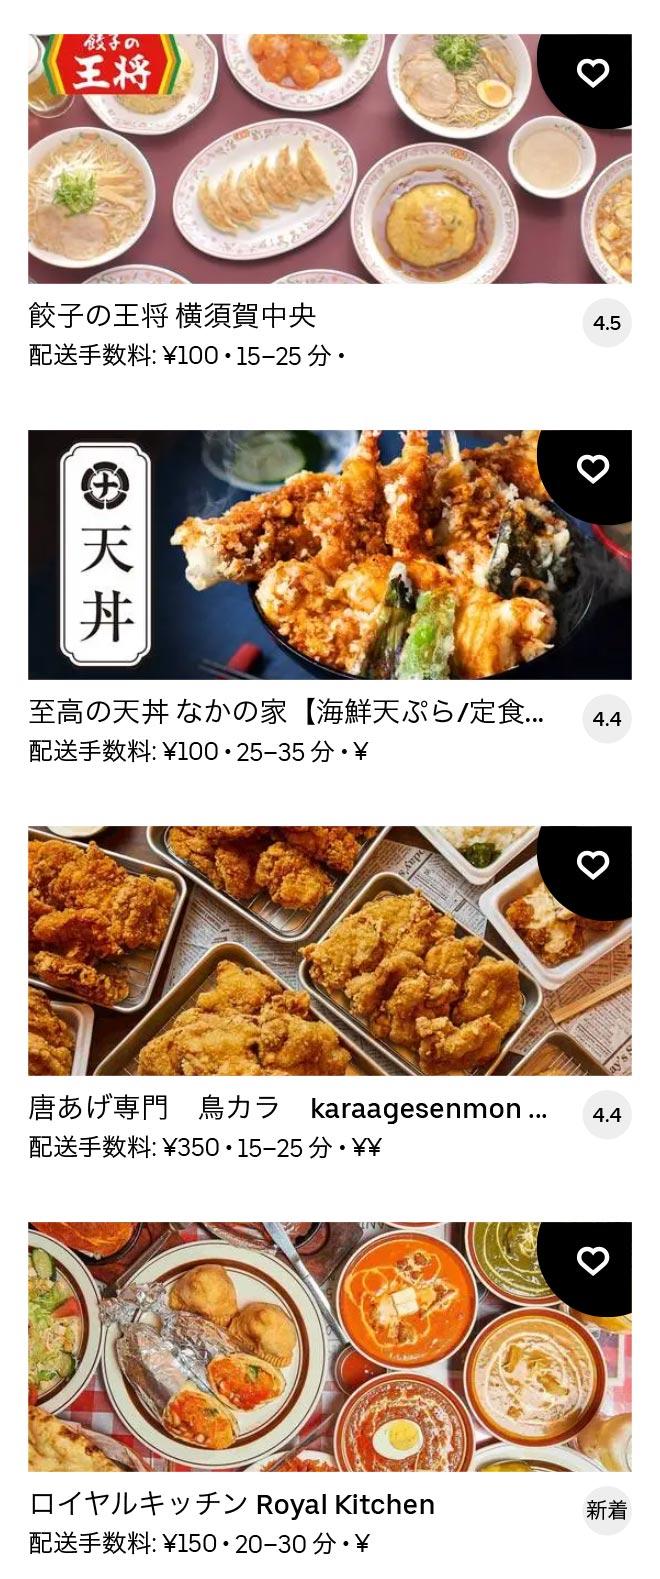 Yokosuka chuo menu 2011 09